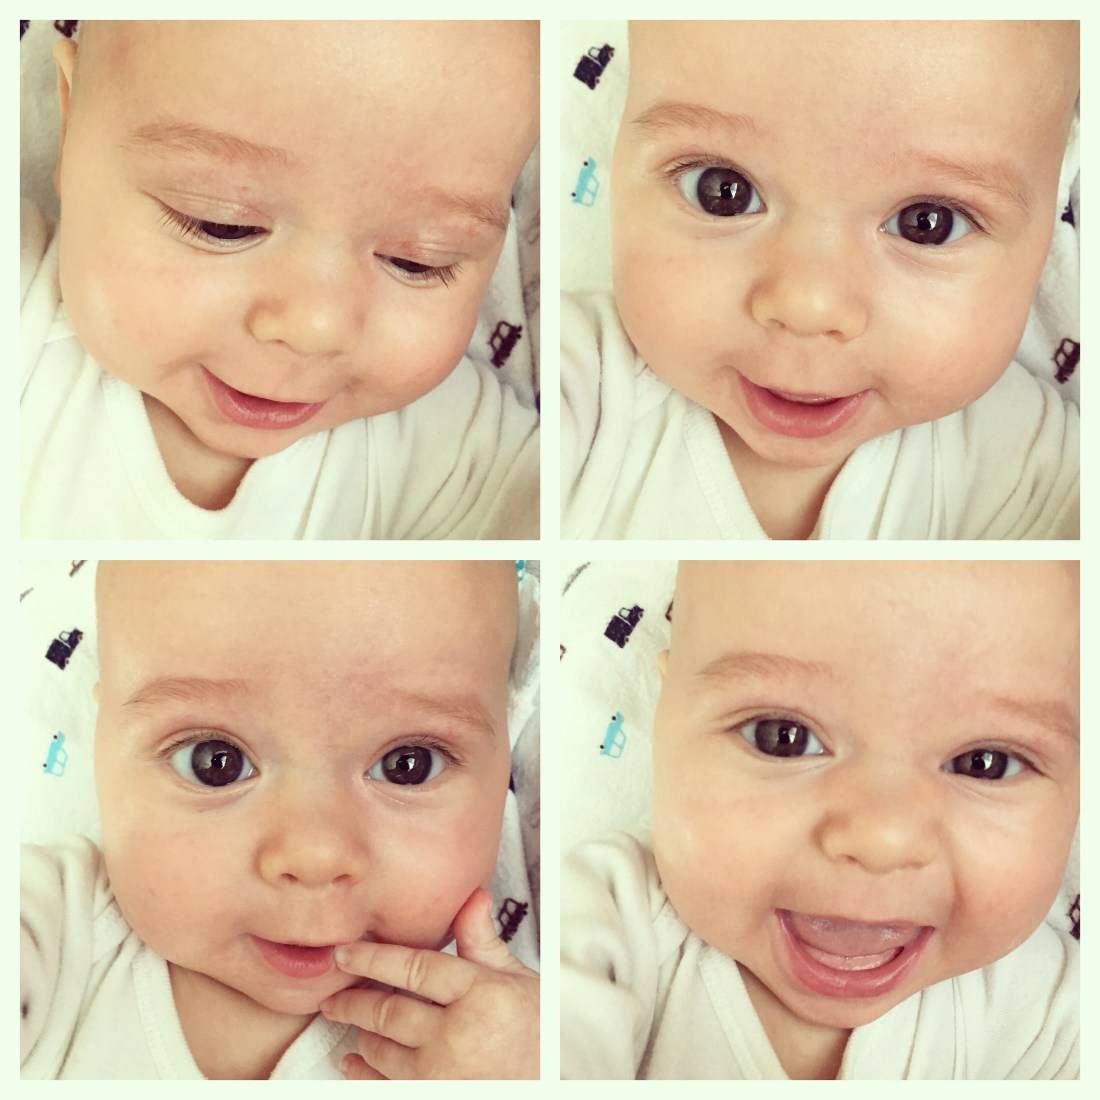 isaiah-5-months-faces